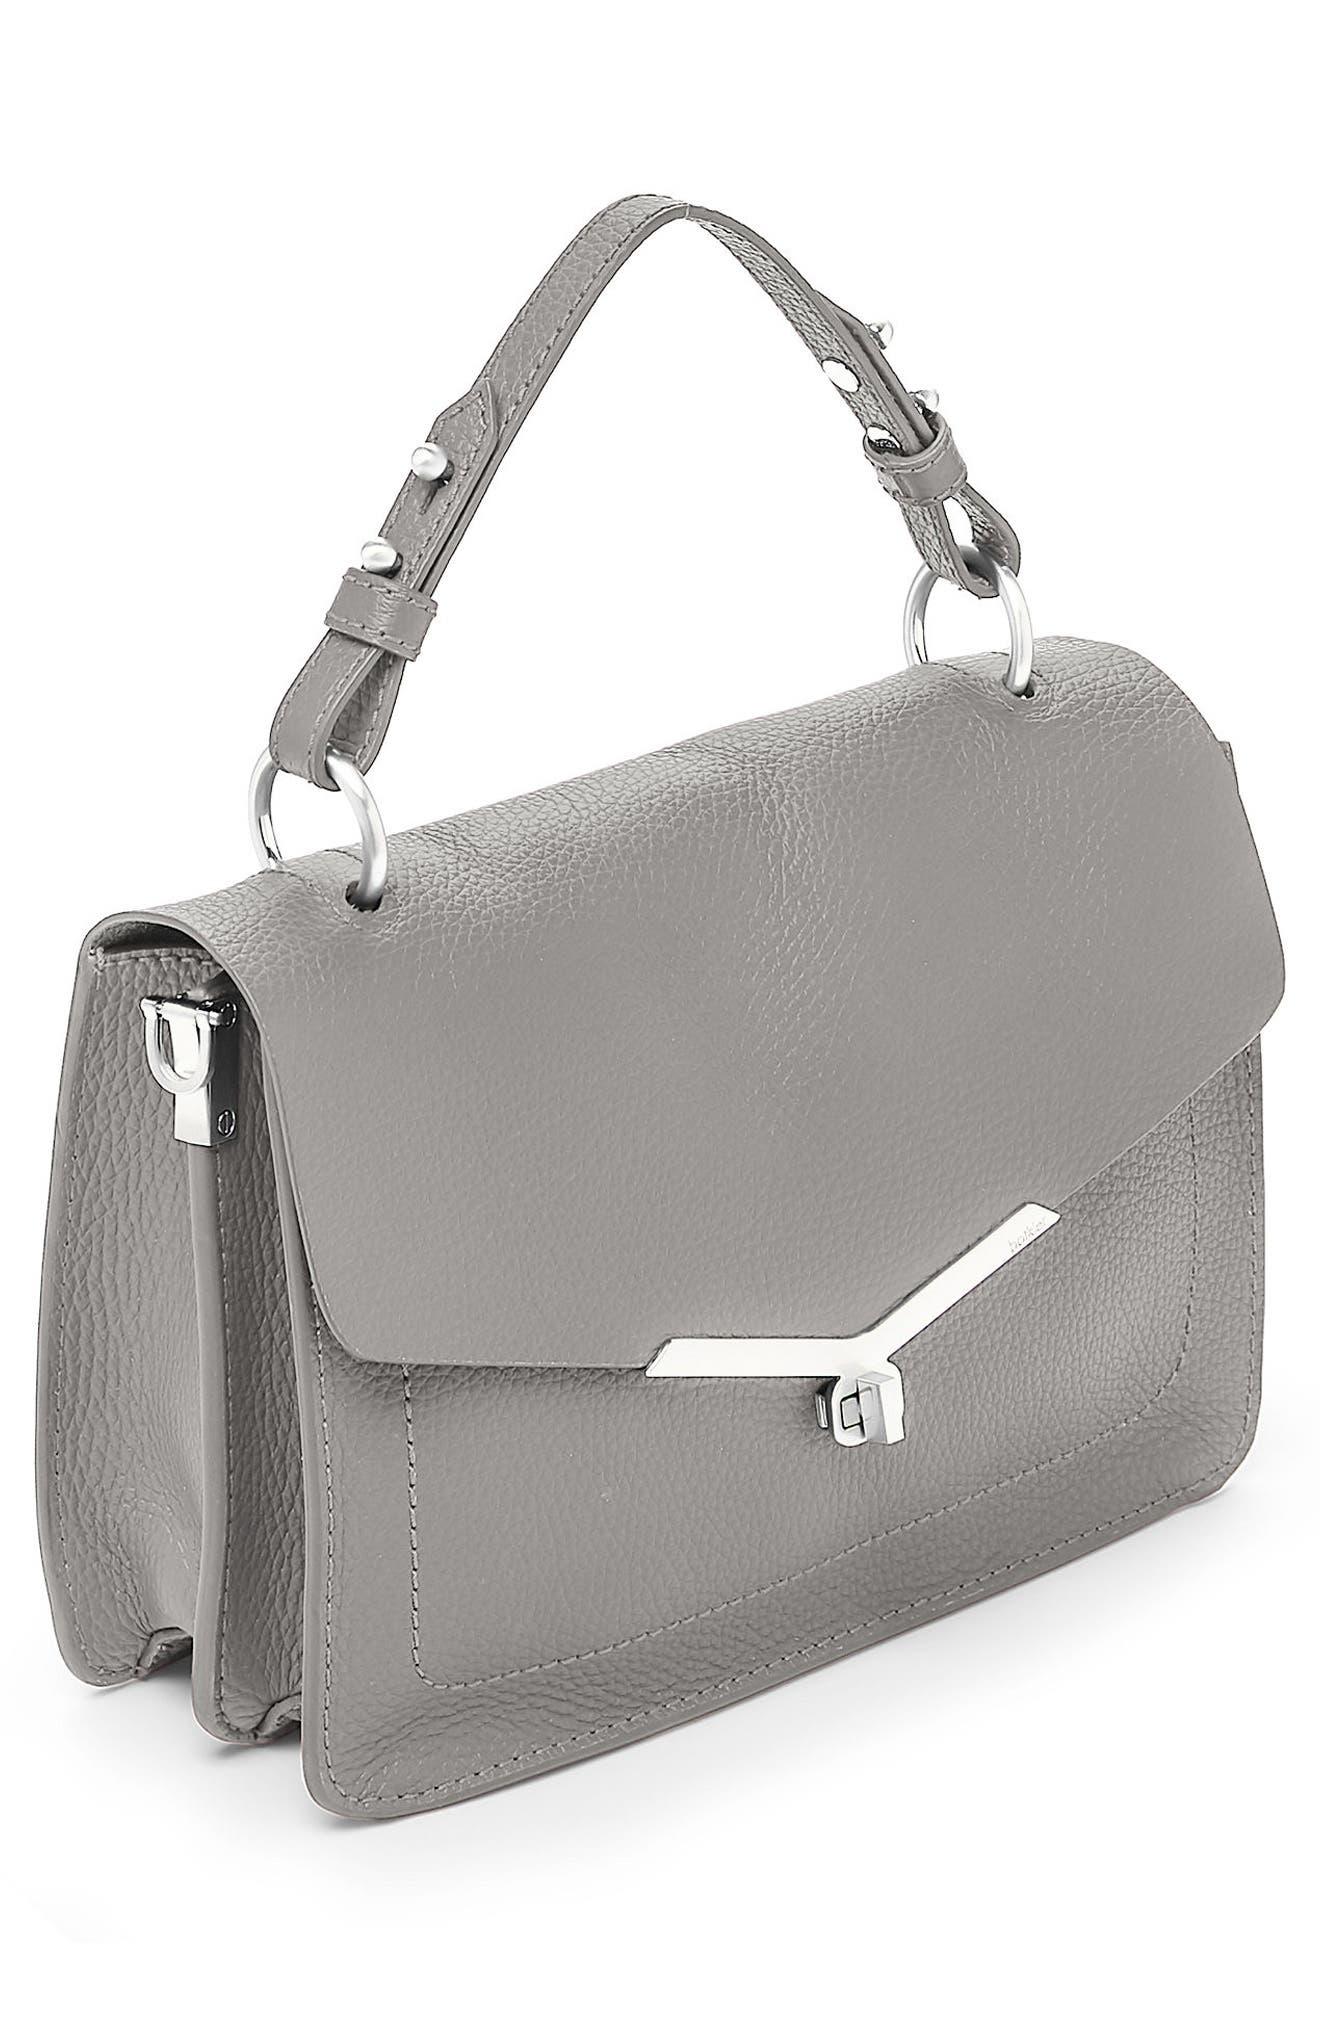 Vivi Calfskin Leather Satchel,                             Alternate thumbnail 3, color,                             Grey